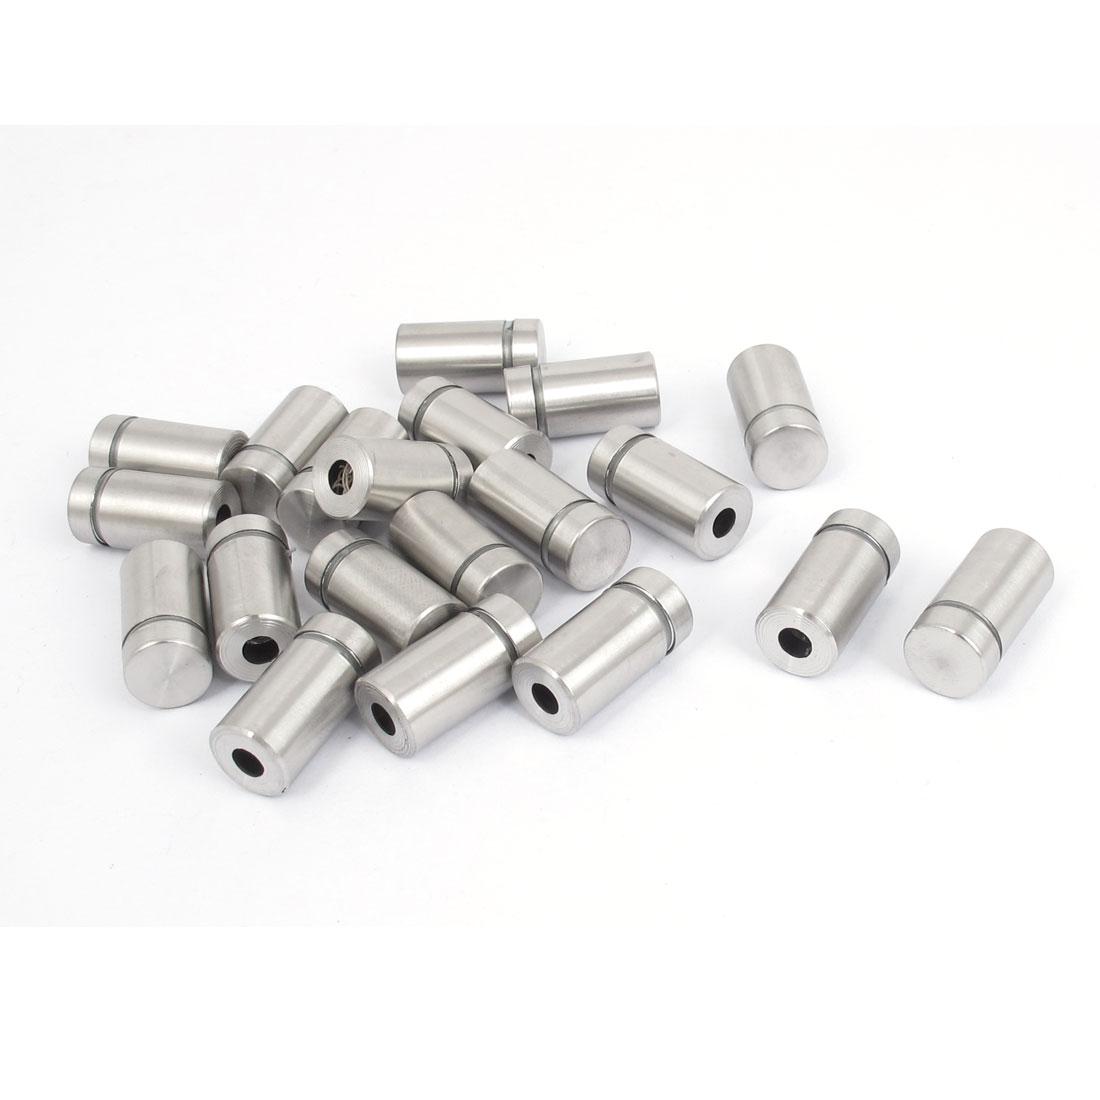 12mm x 22mm Stainless Steel Advertising Frameless Glass Standoff Pins 20pcs